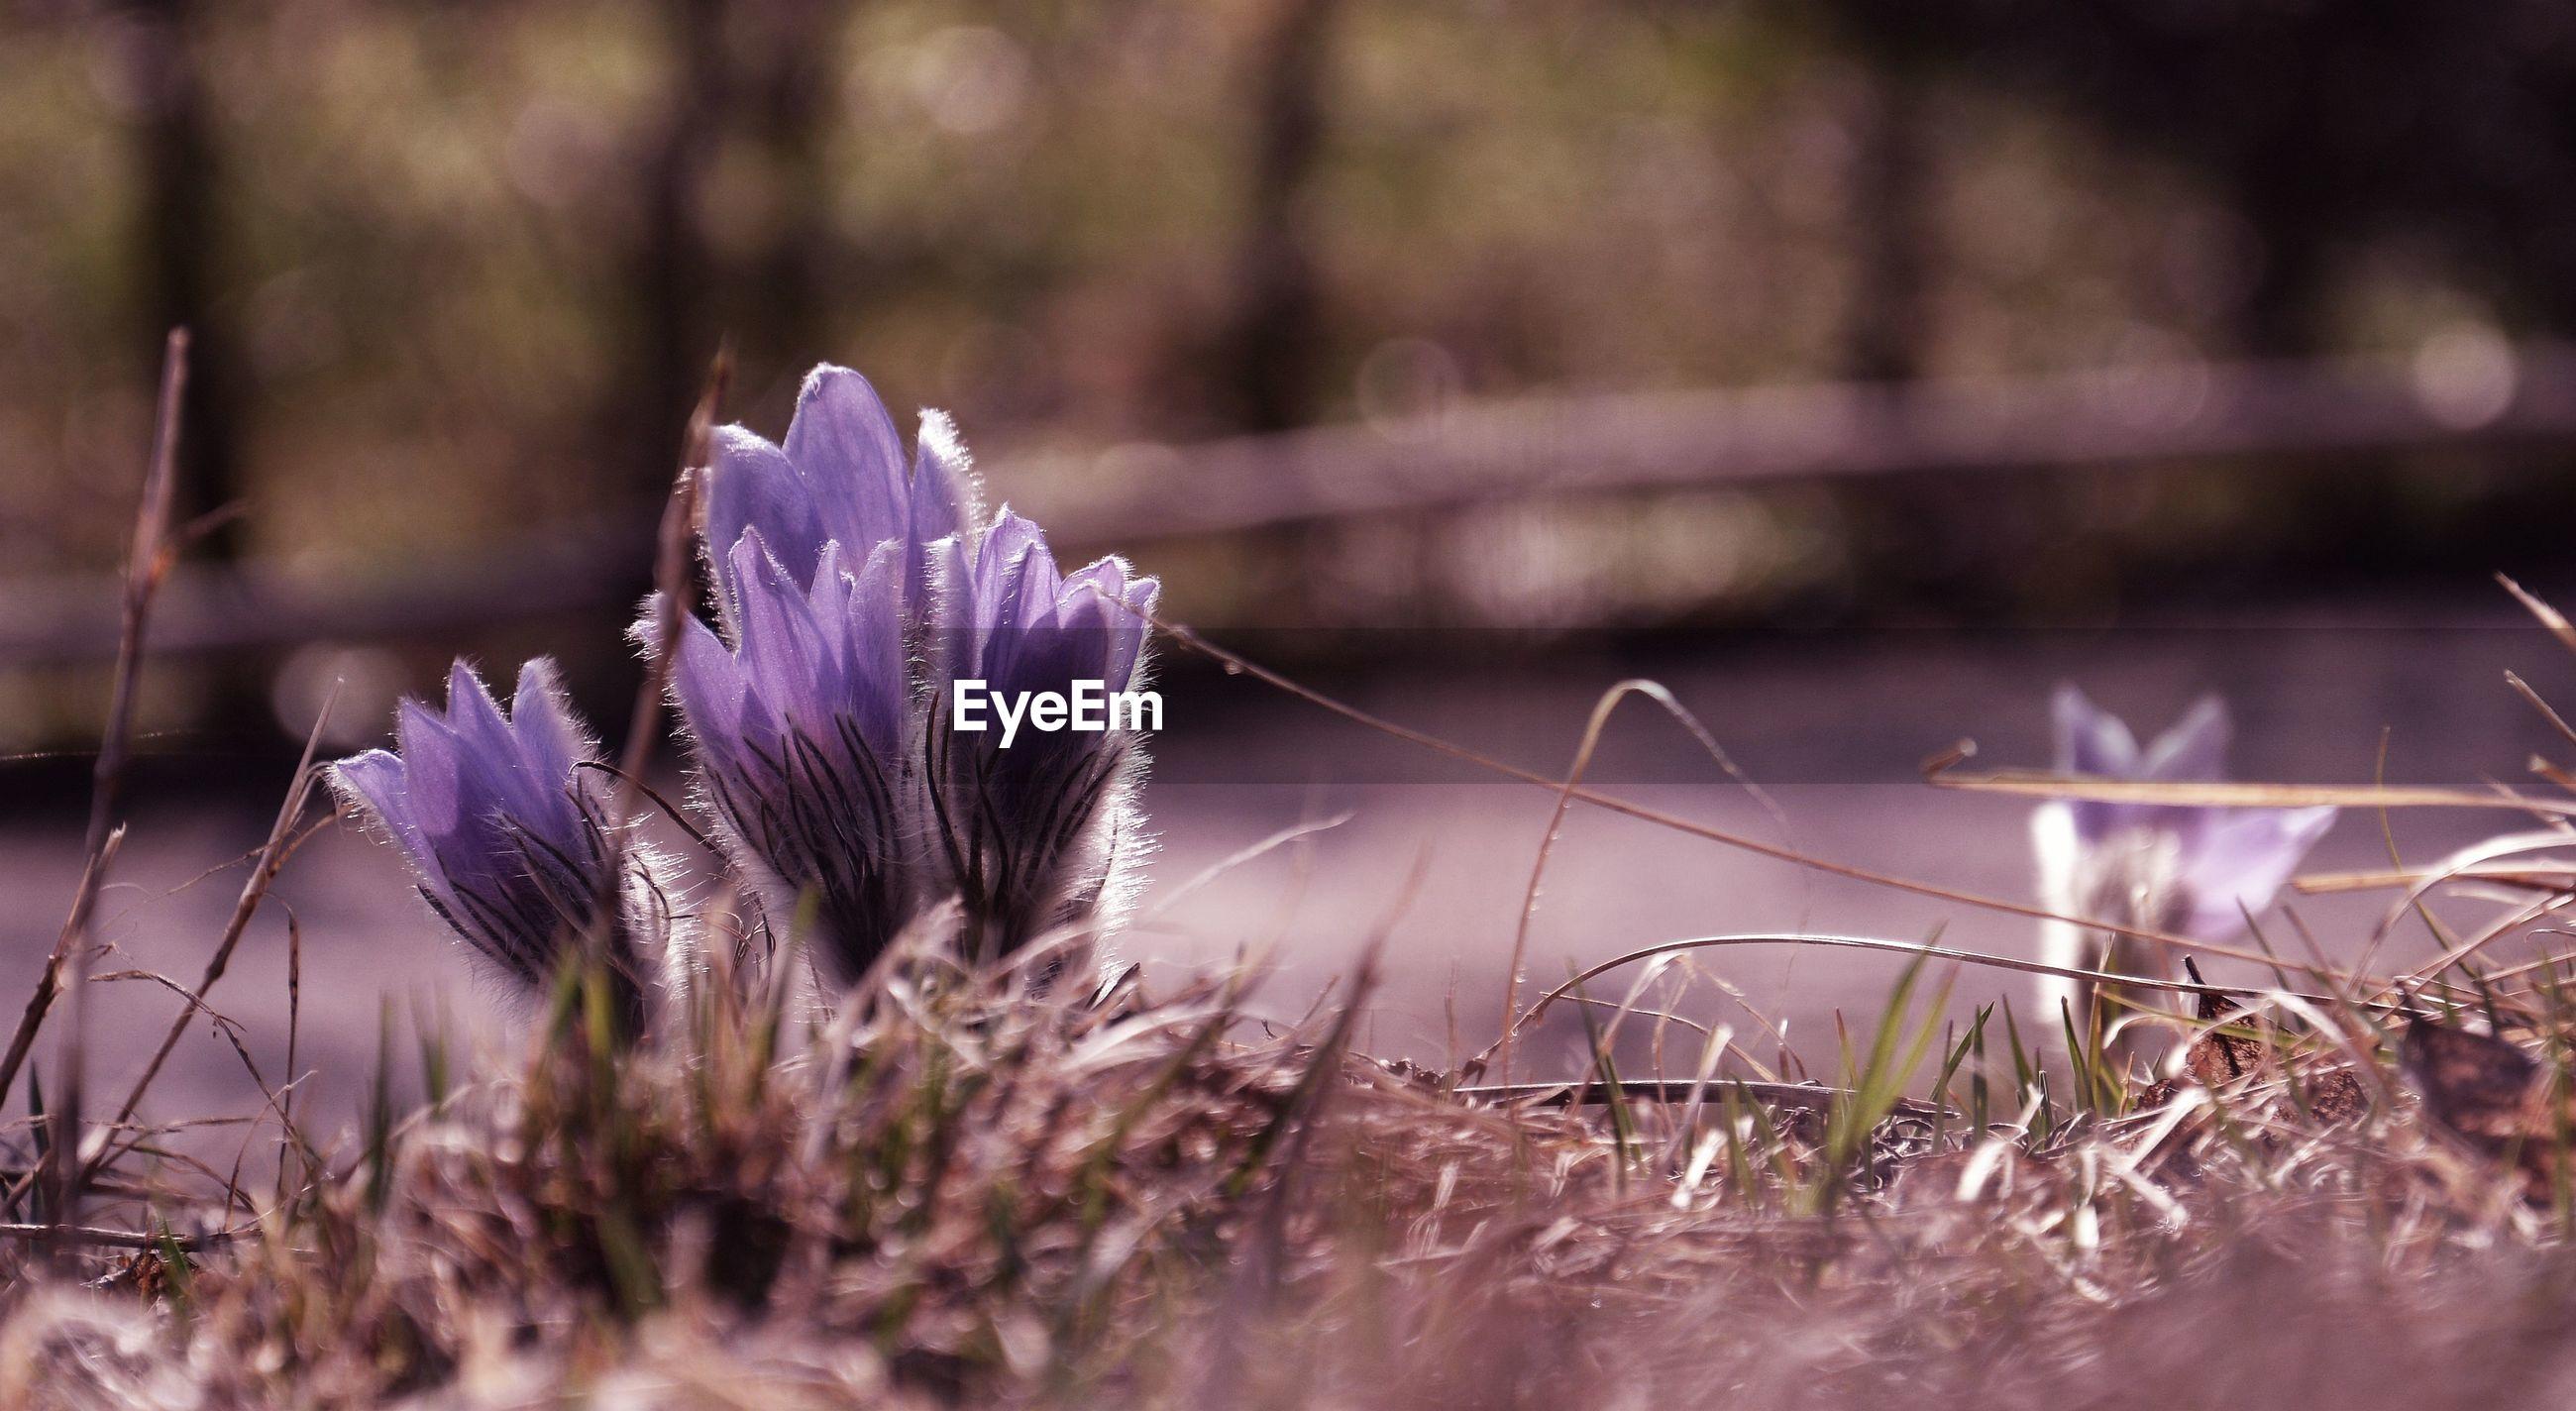 CLOSE-UP OF PURPLE CROCUS FLOWER GROWING ON FIELD